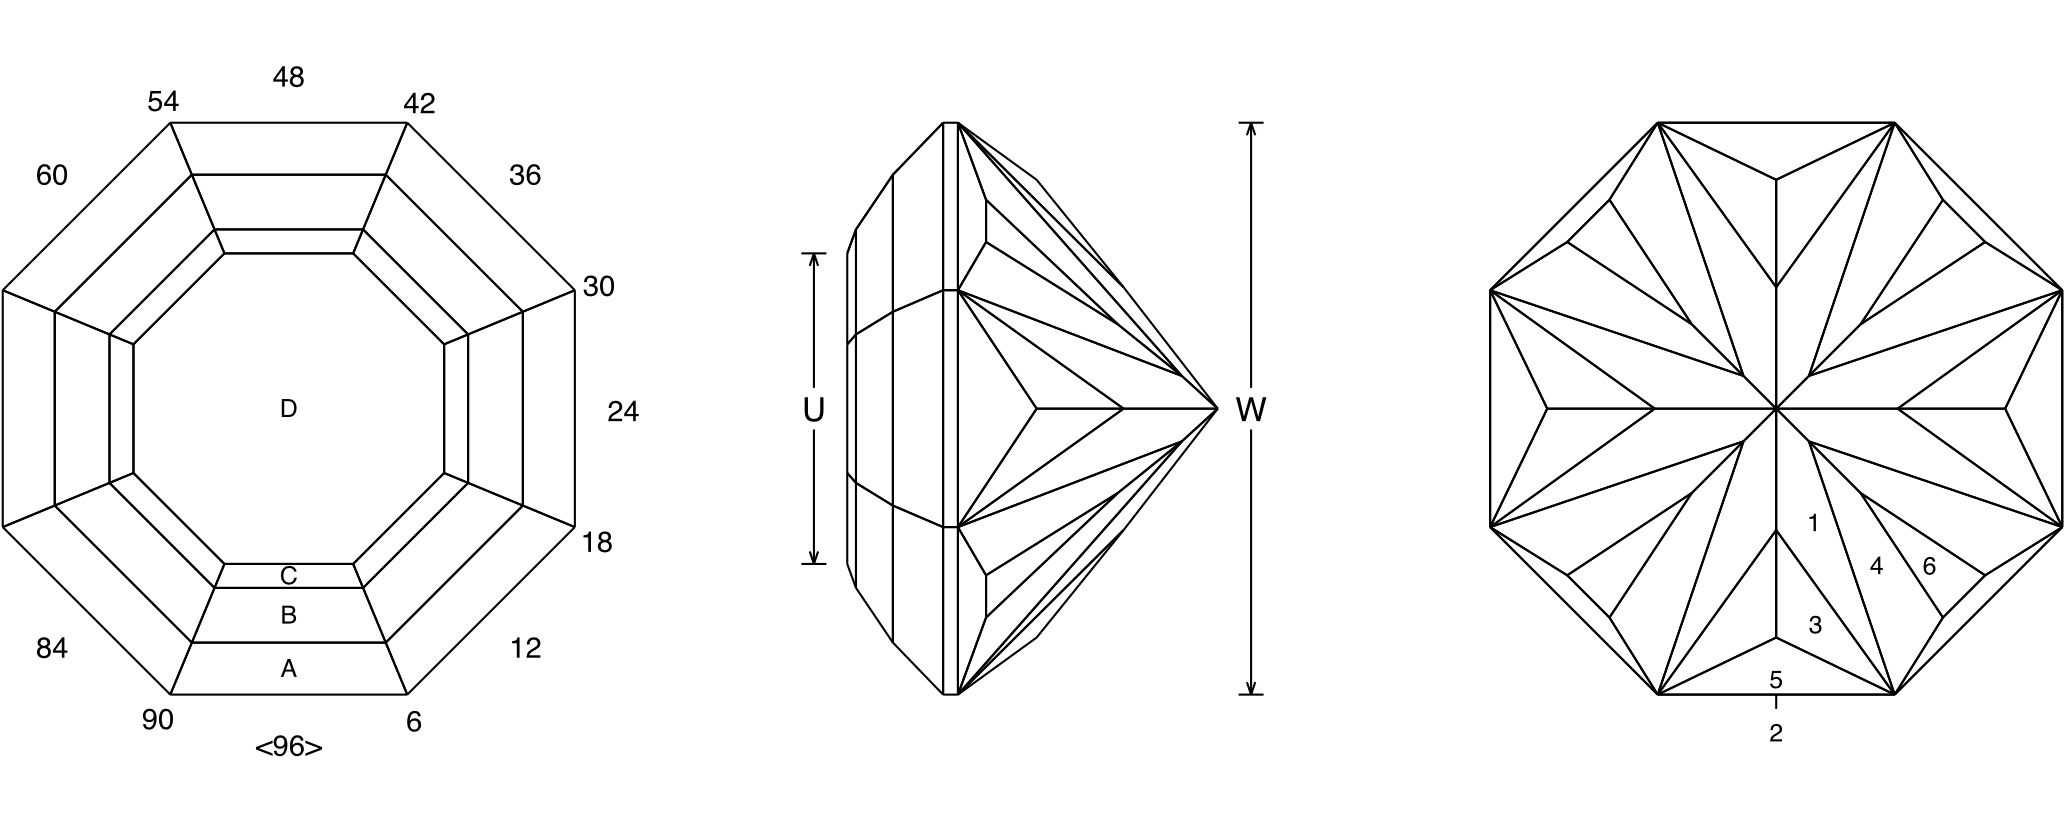 Octobar